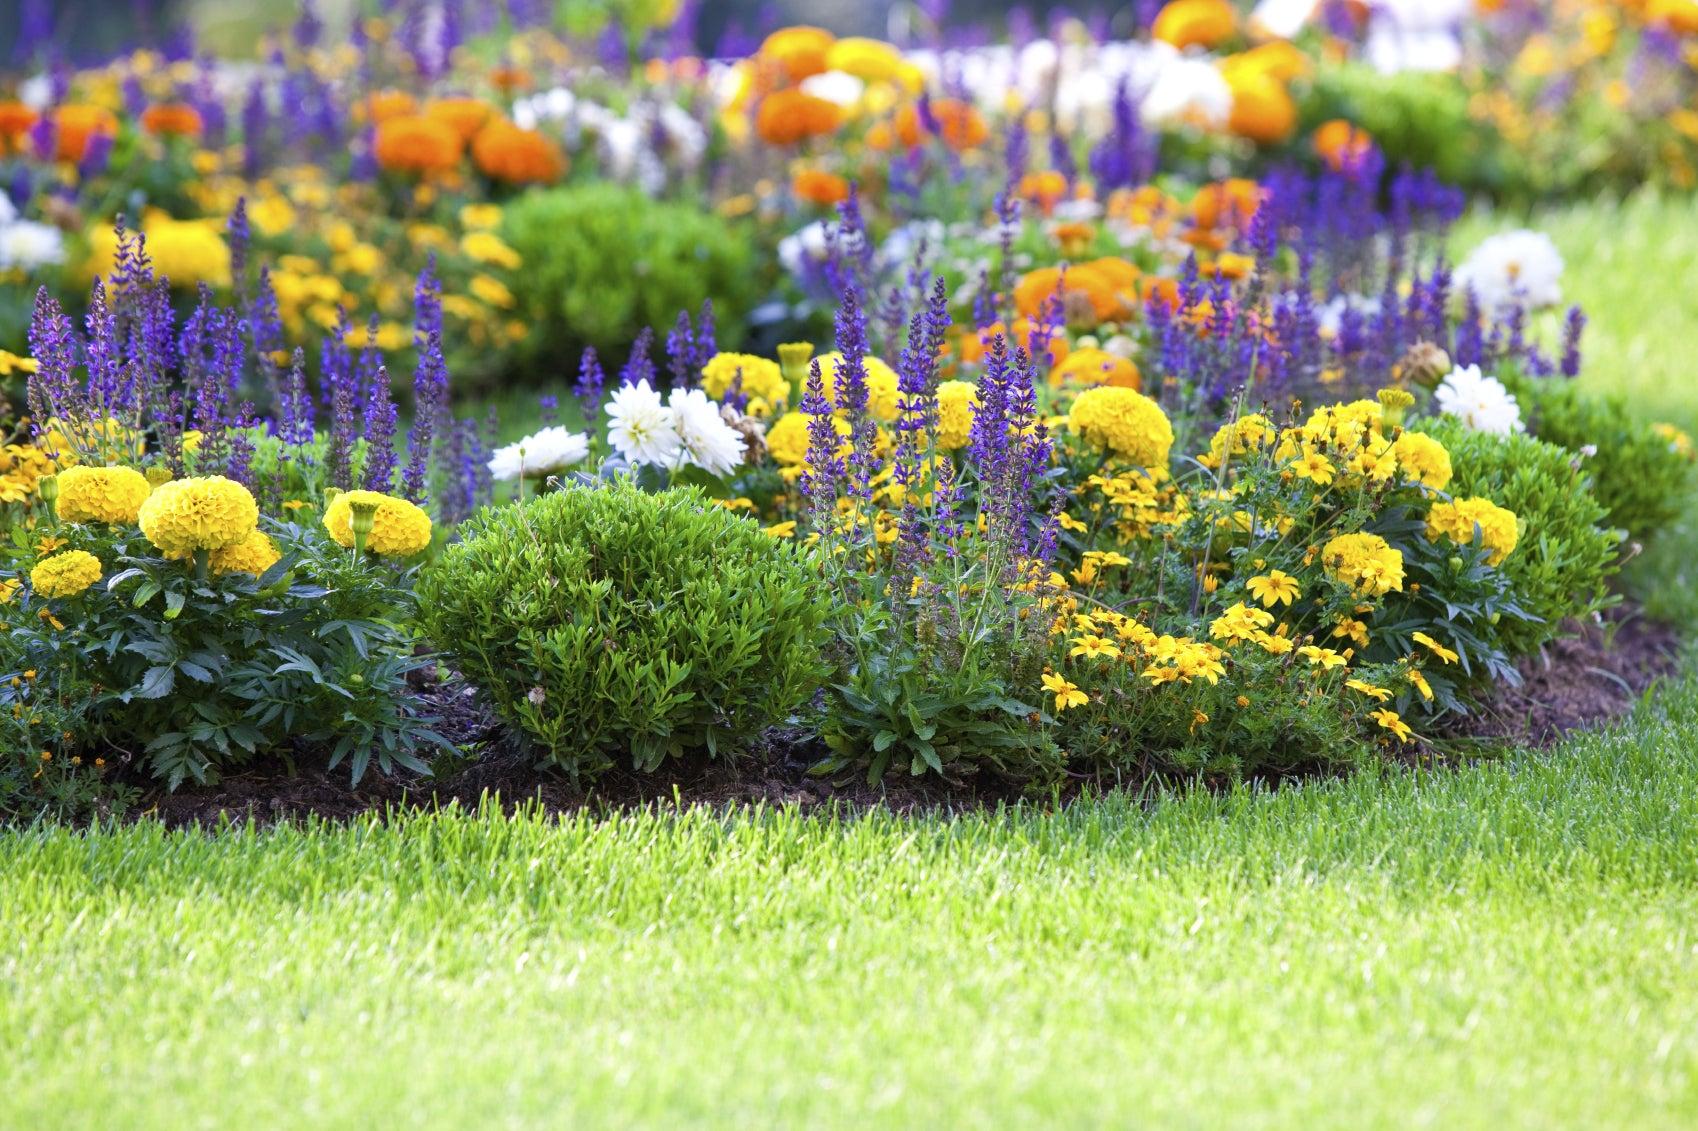 Flower Gardening: How To Start A Flower Garden